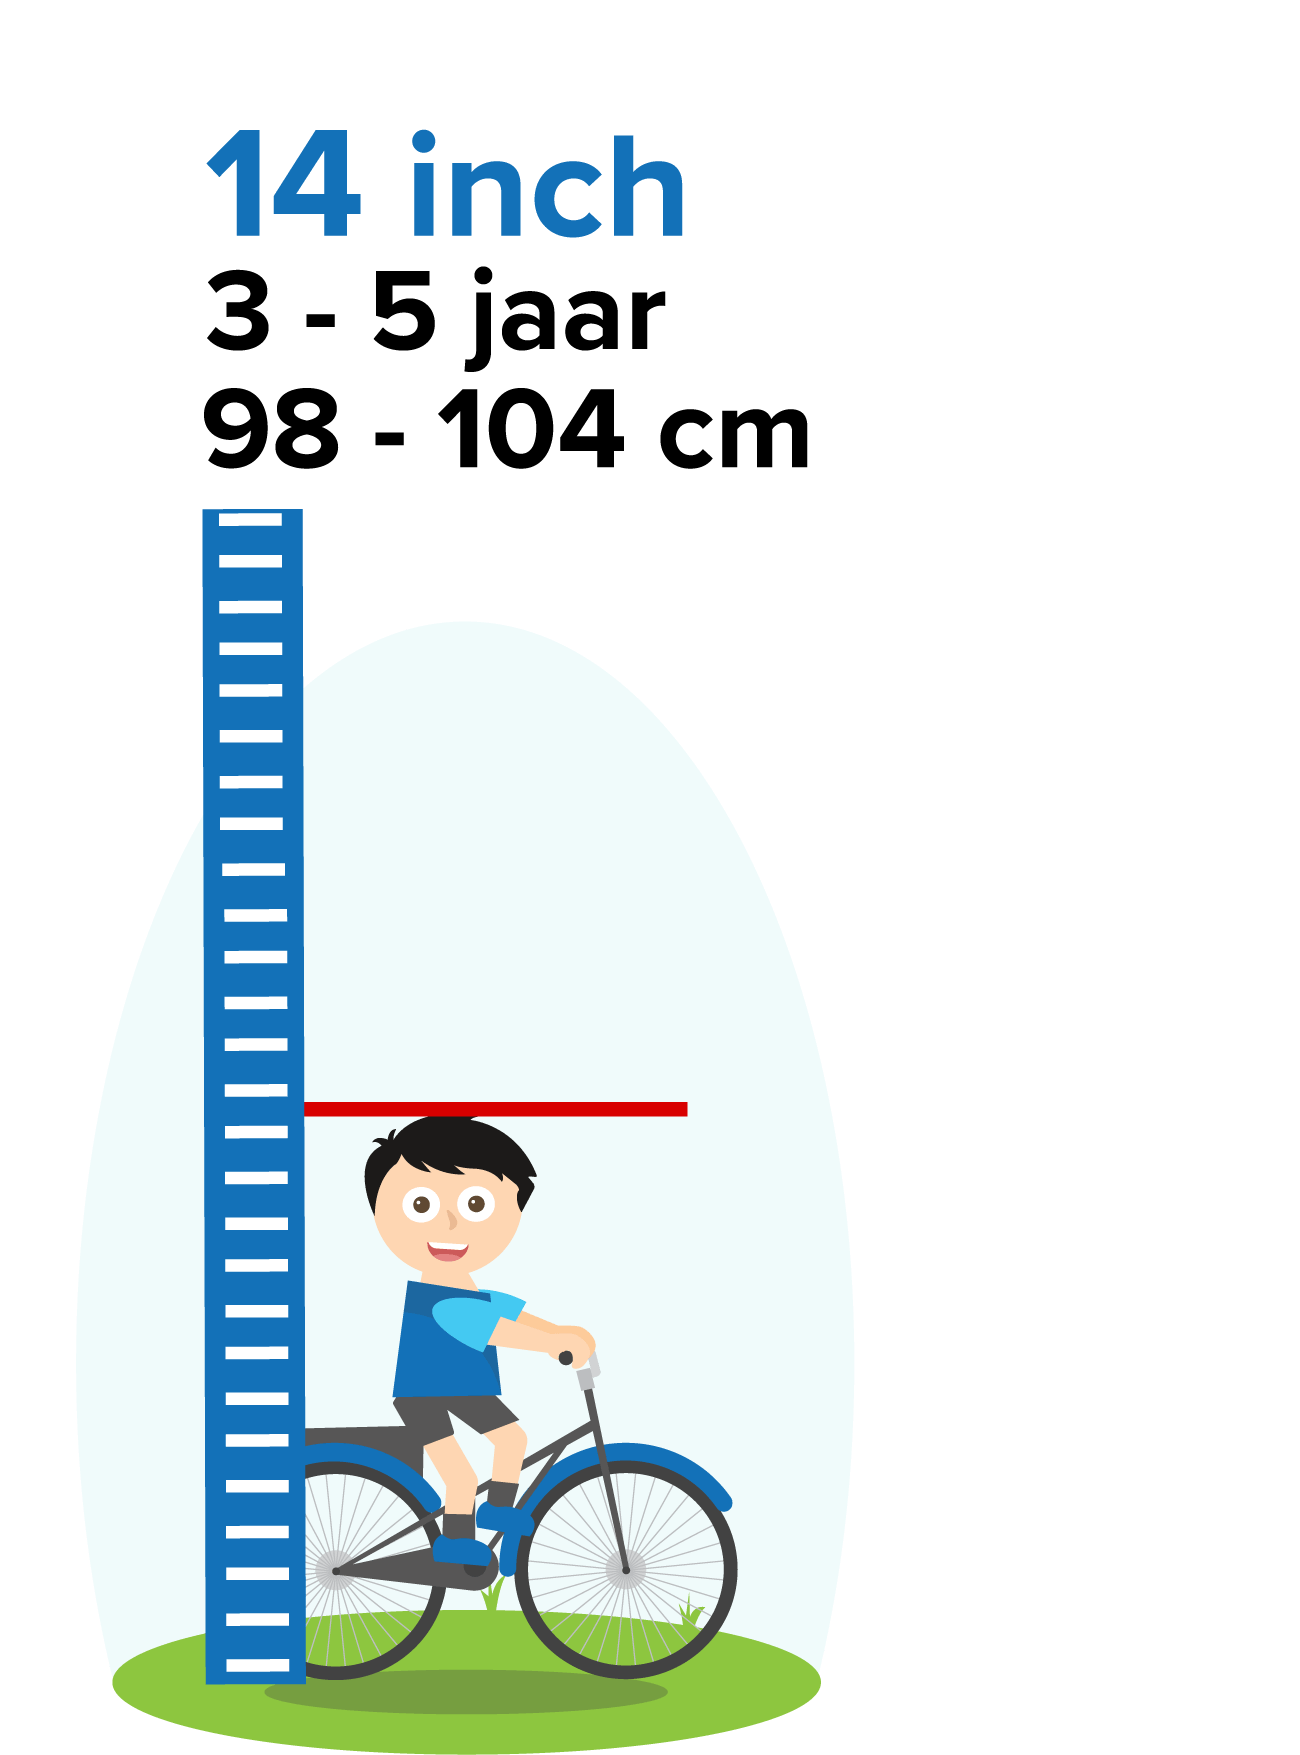 kinderfiets 14 inch